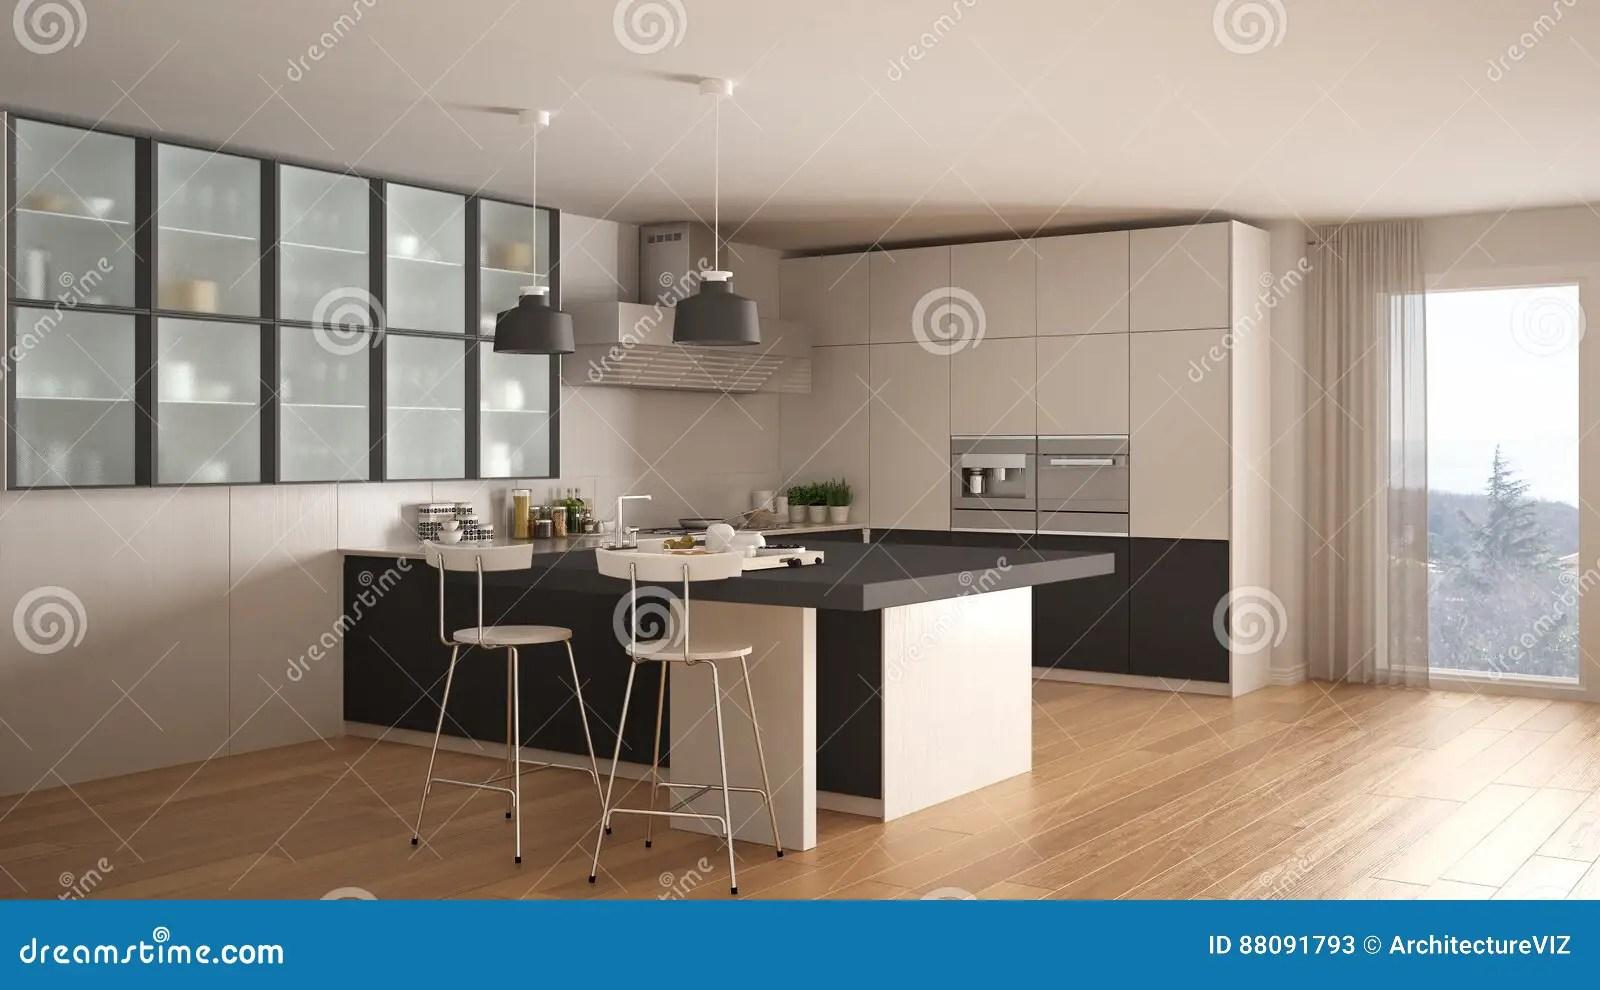 Cucina grigia e bianca cucina moderna con la pavimentazione in